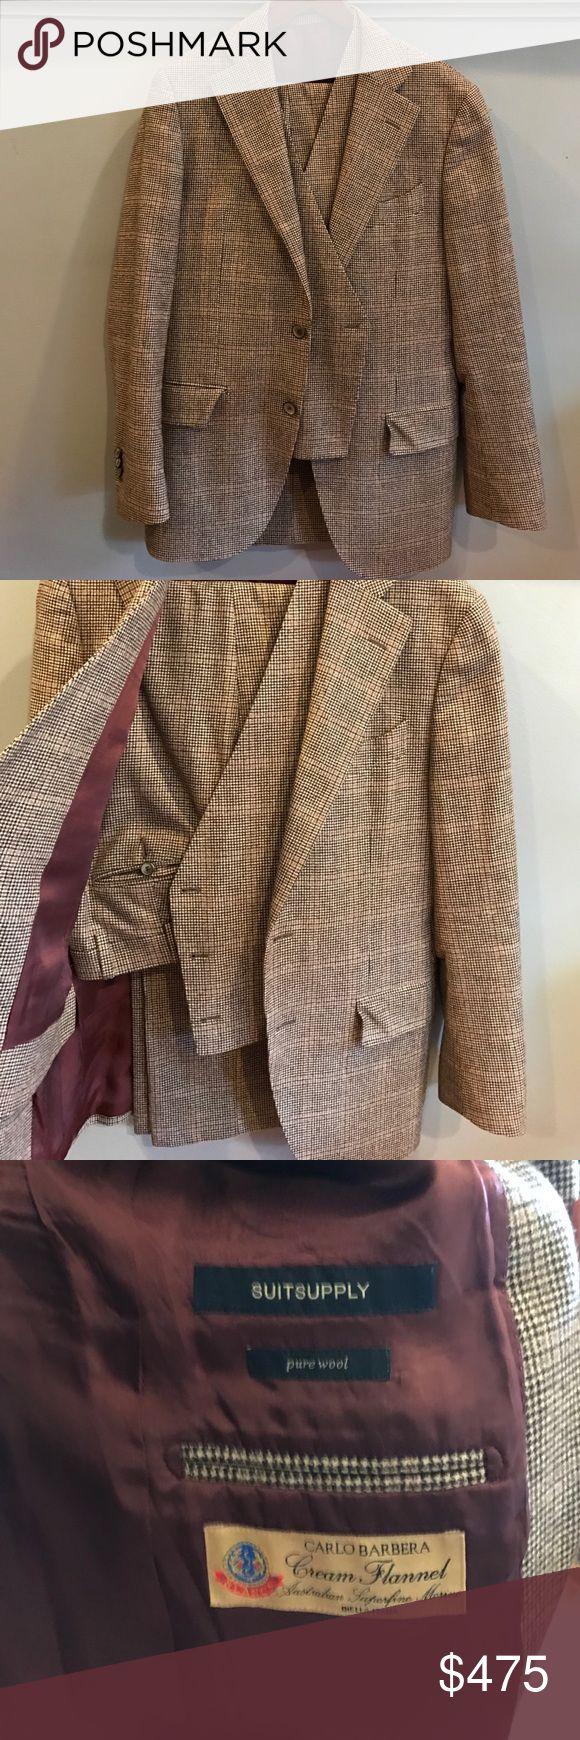 Suitsupply Men's Suit Suitsupply. 3 Piece Suit. Double Breasted Vest. GREAT Condition. EUR 48 UK 38 Suits & Blazers Suits